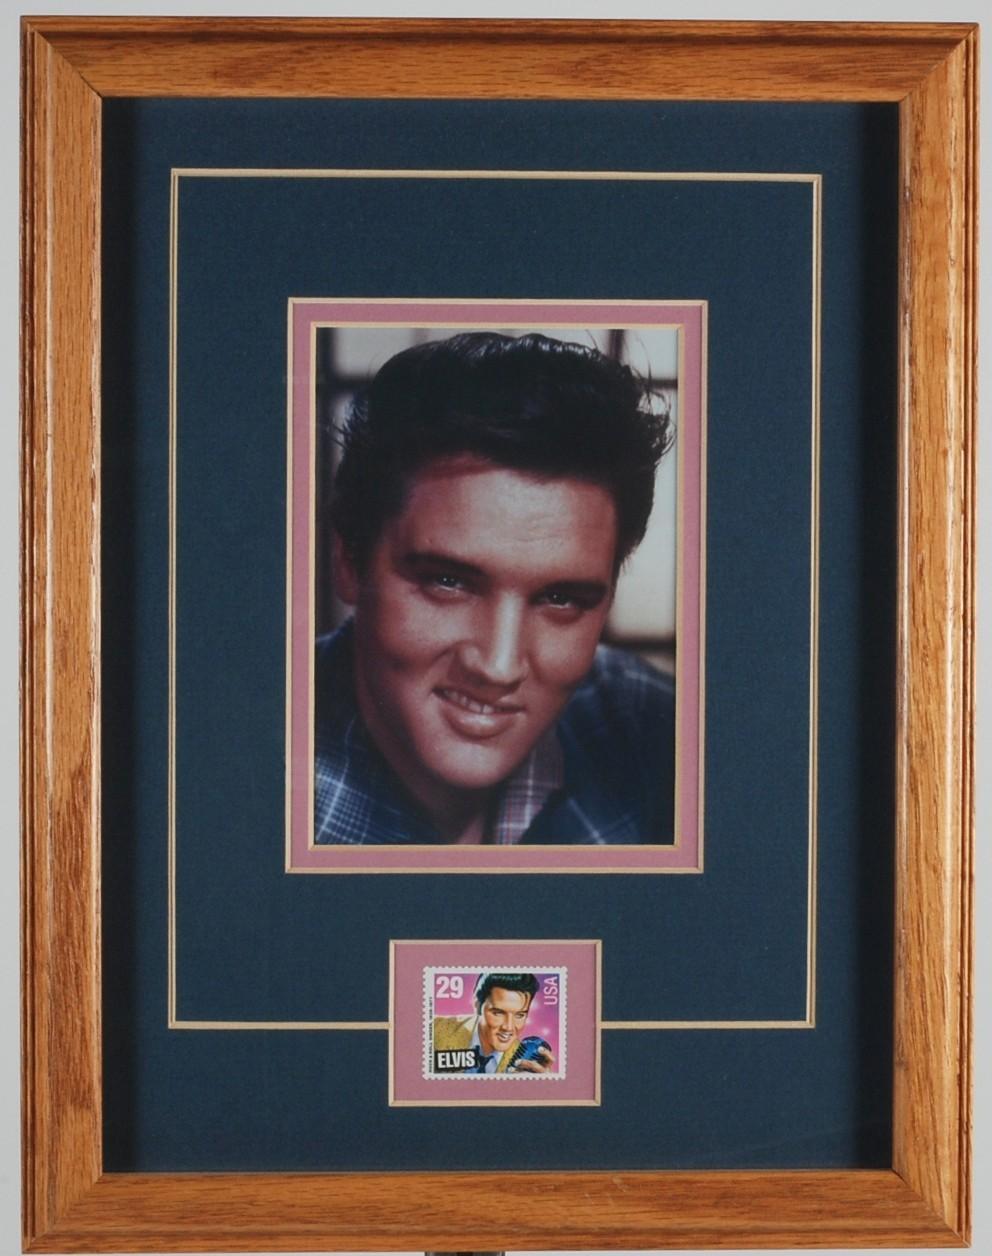 Elvis Presley Color Picture w 29-cent Commemorative US Stamp w Framed Portrait